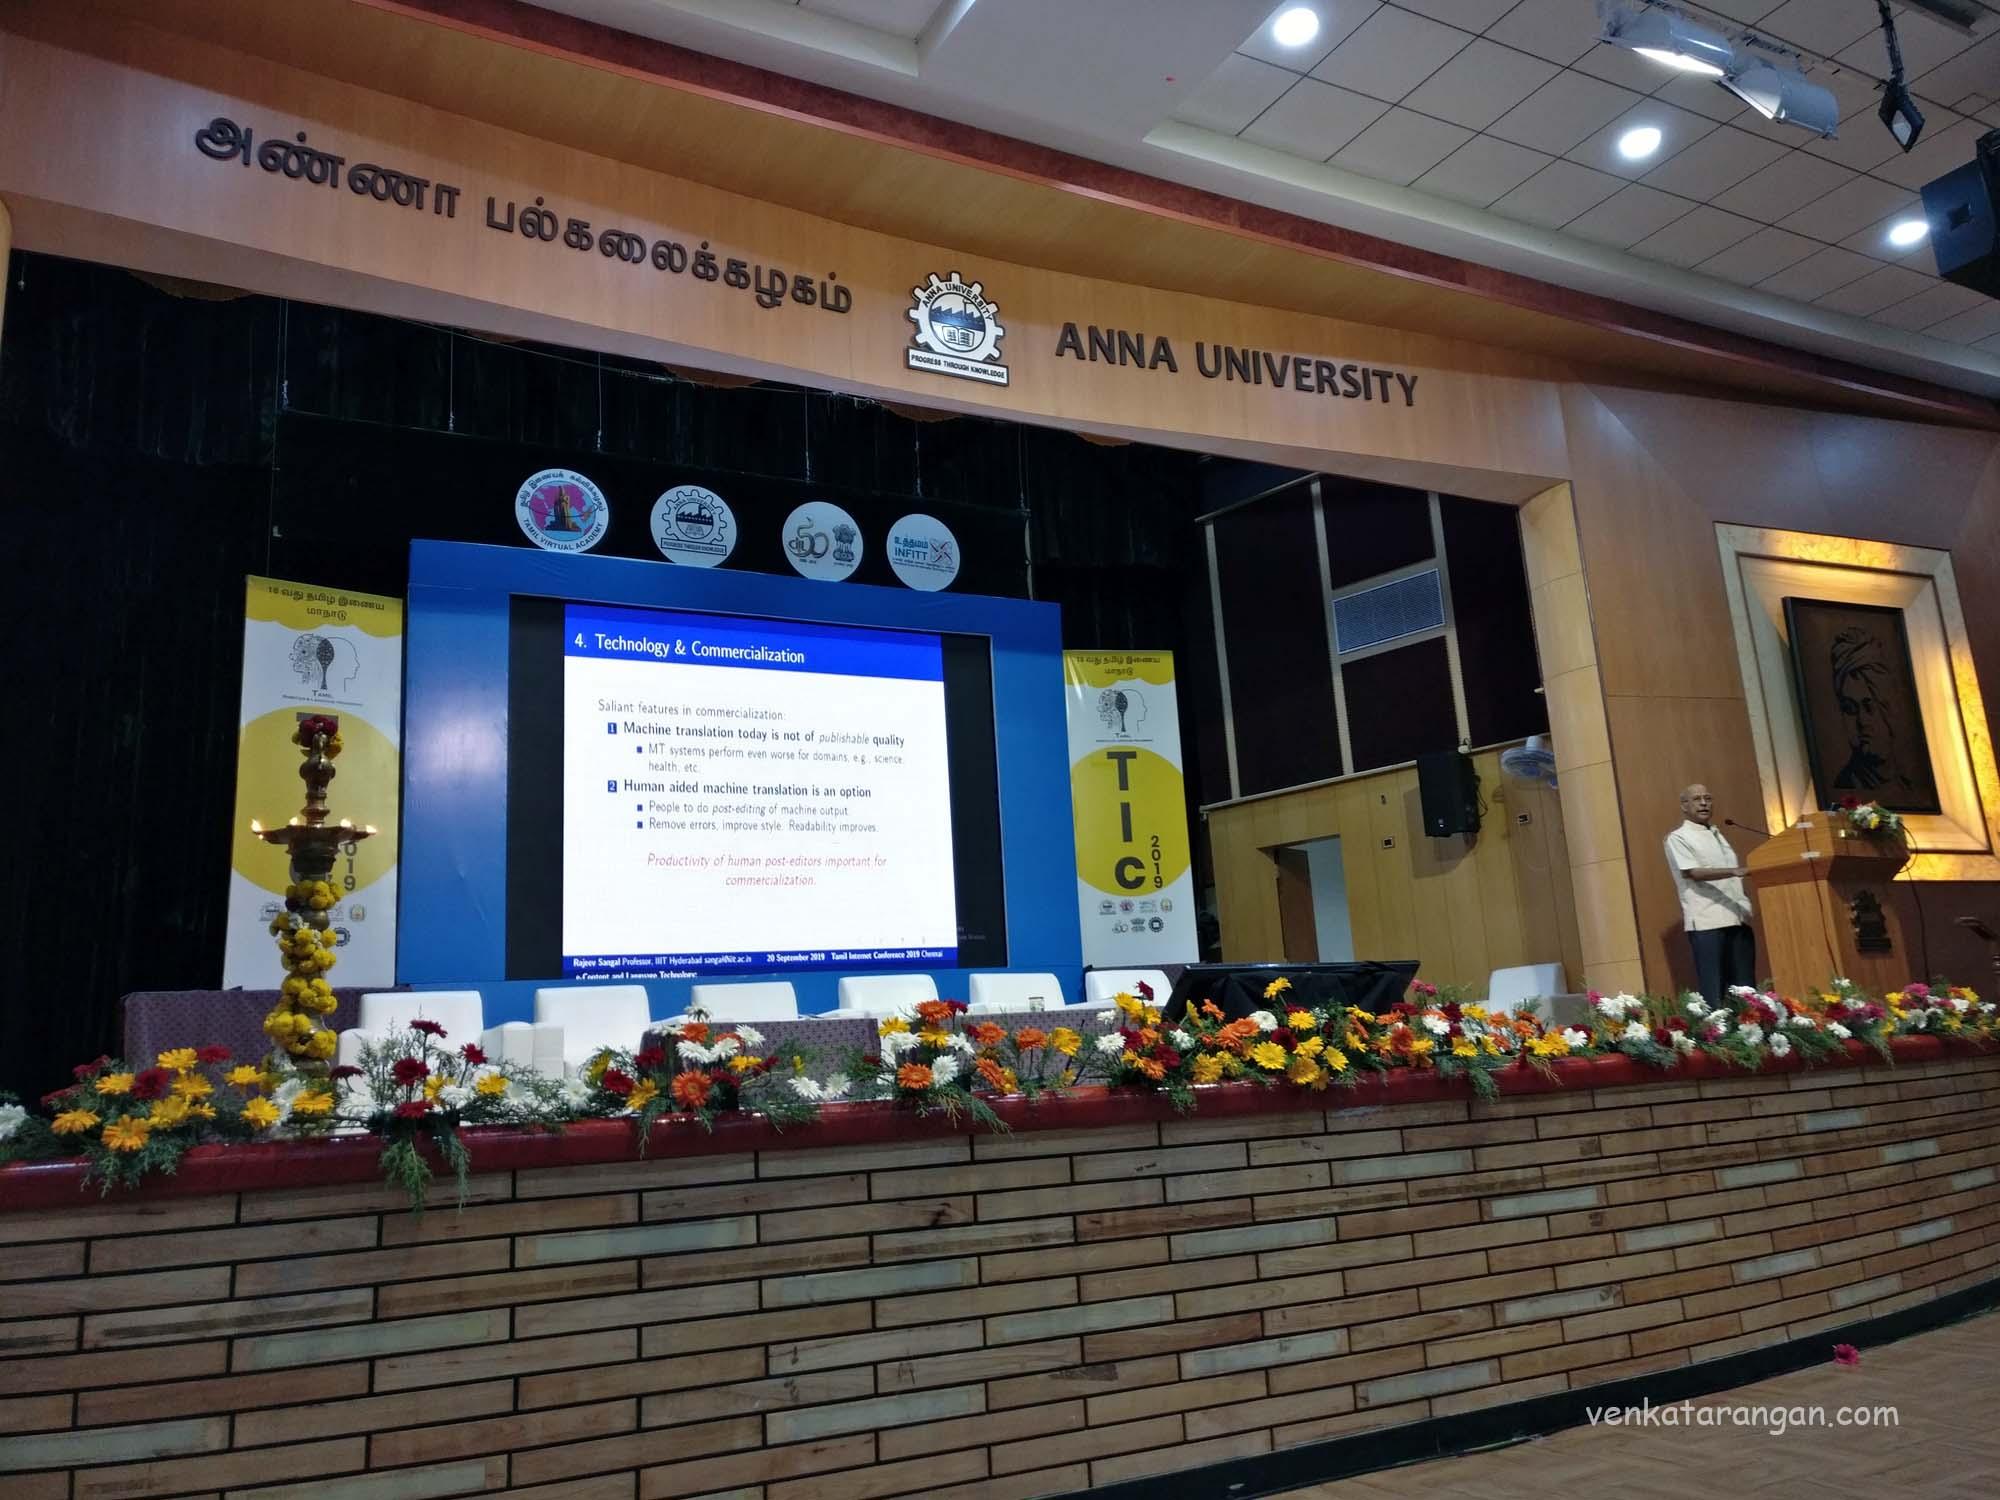 Prof Rajeev Sangal of IIIT Hyderabad